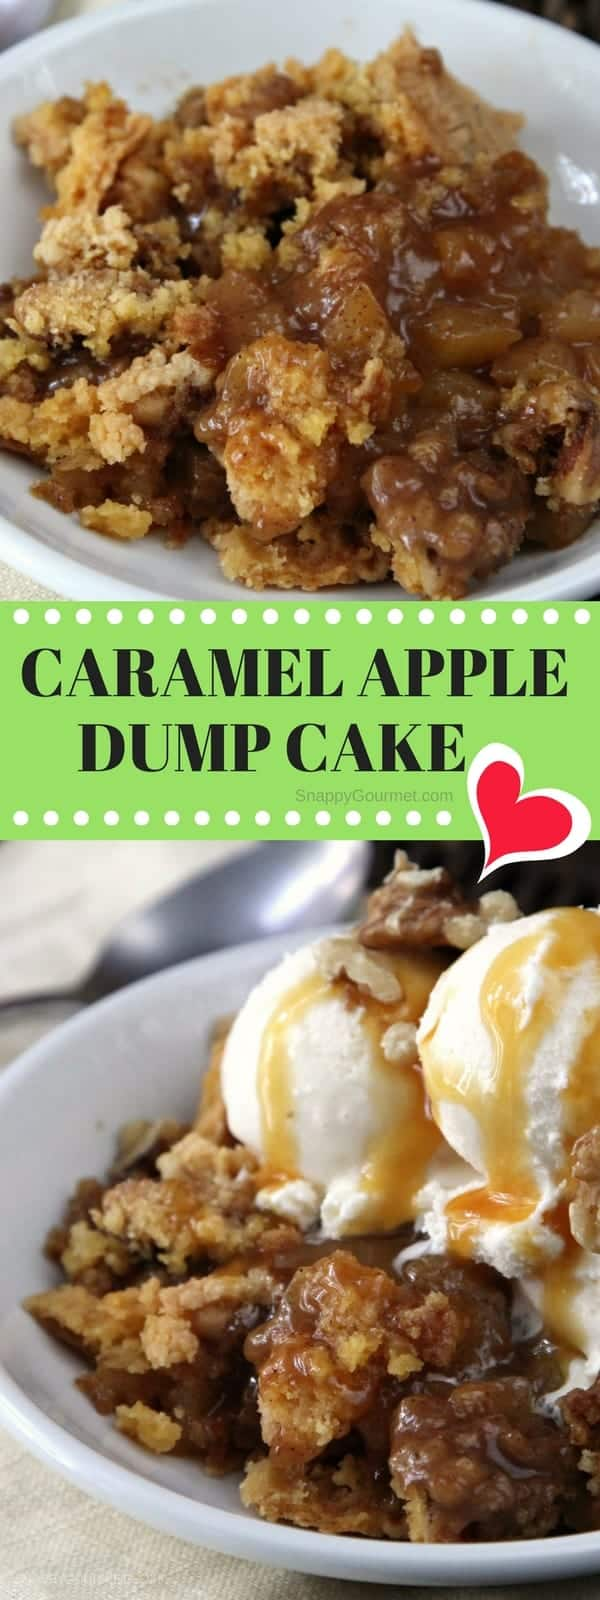 Caramel Apple Dump Cake Recipe - easy apple cake recipe with fresh apples. SnappyGourmet.com #CaramelApple #Cake #DumpCake #SnappyGourmet